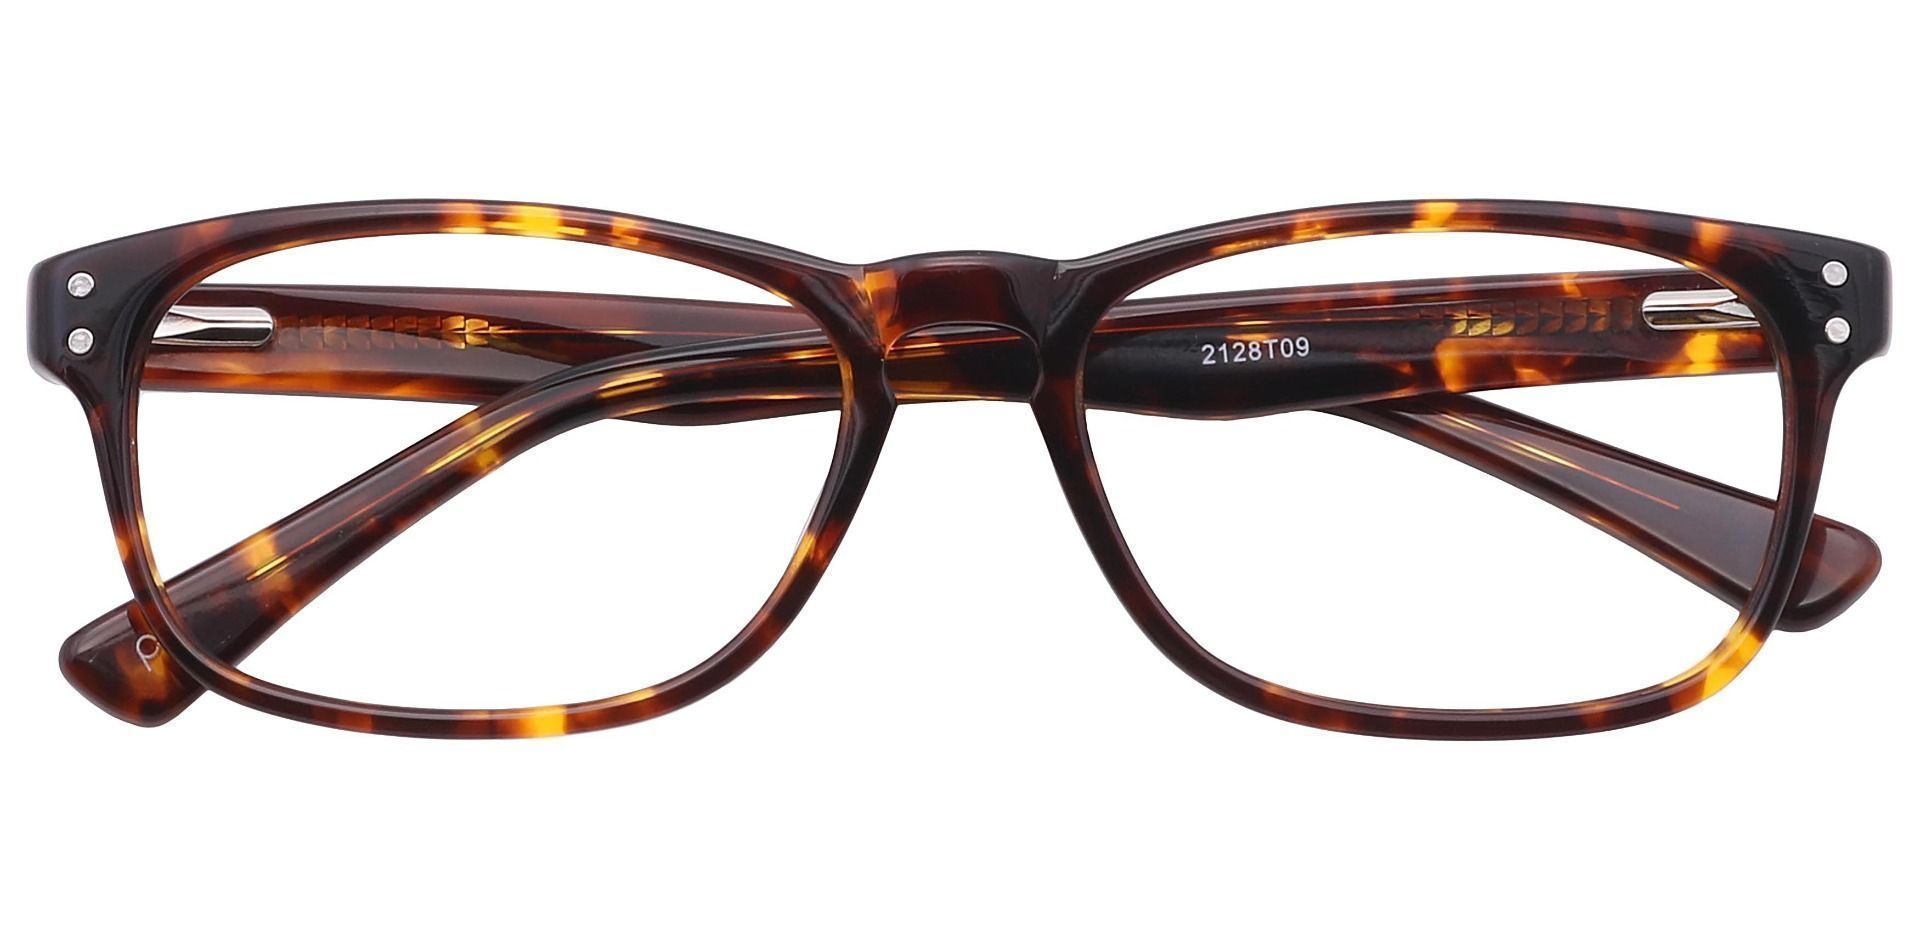 Morris Rectangle Progressive Glasses - Tortoise